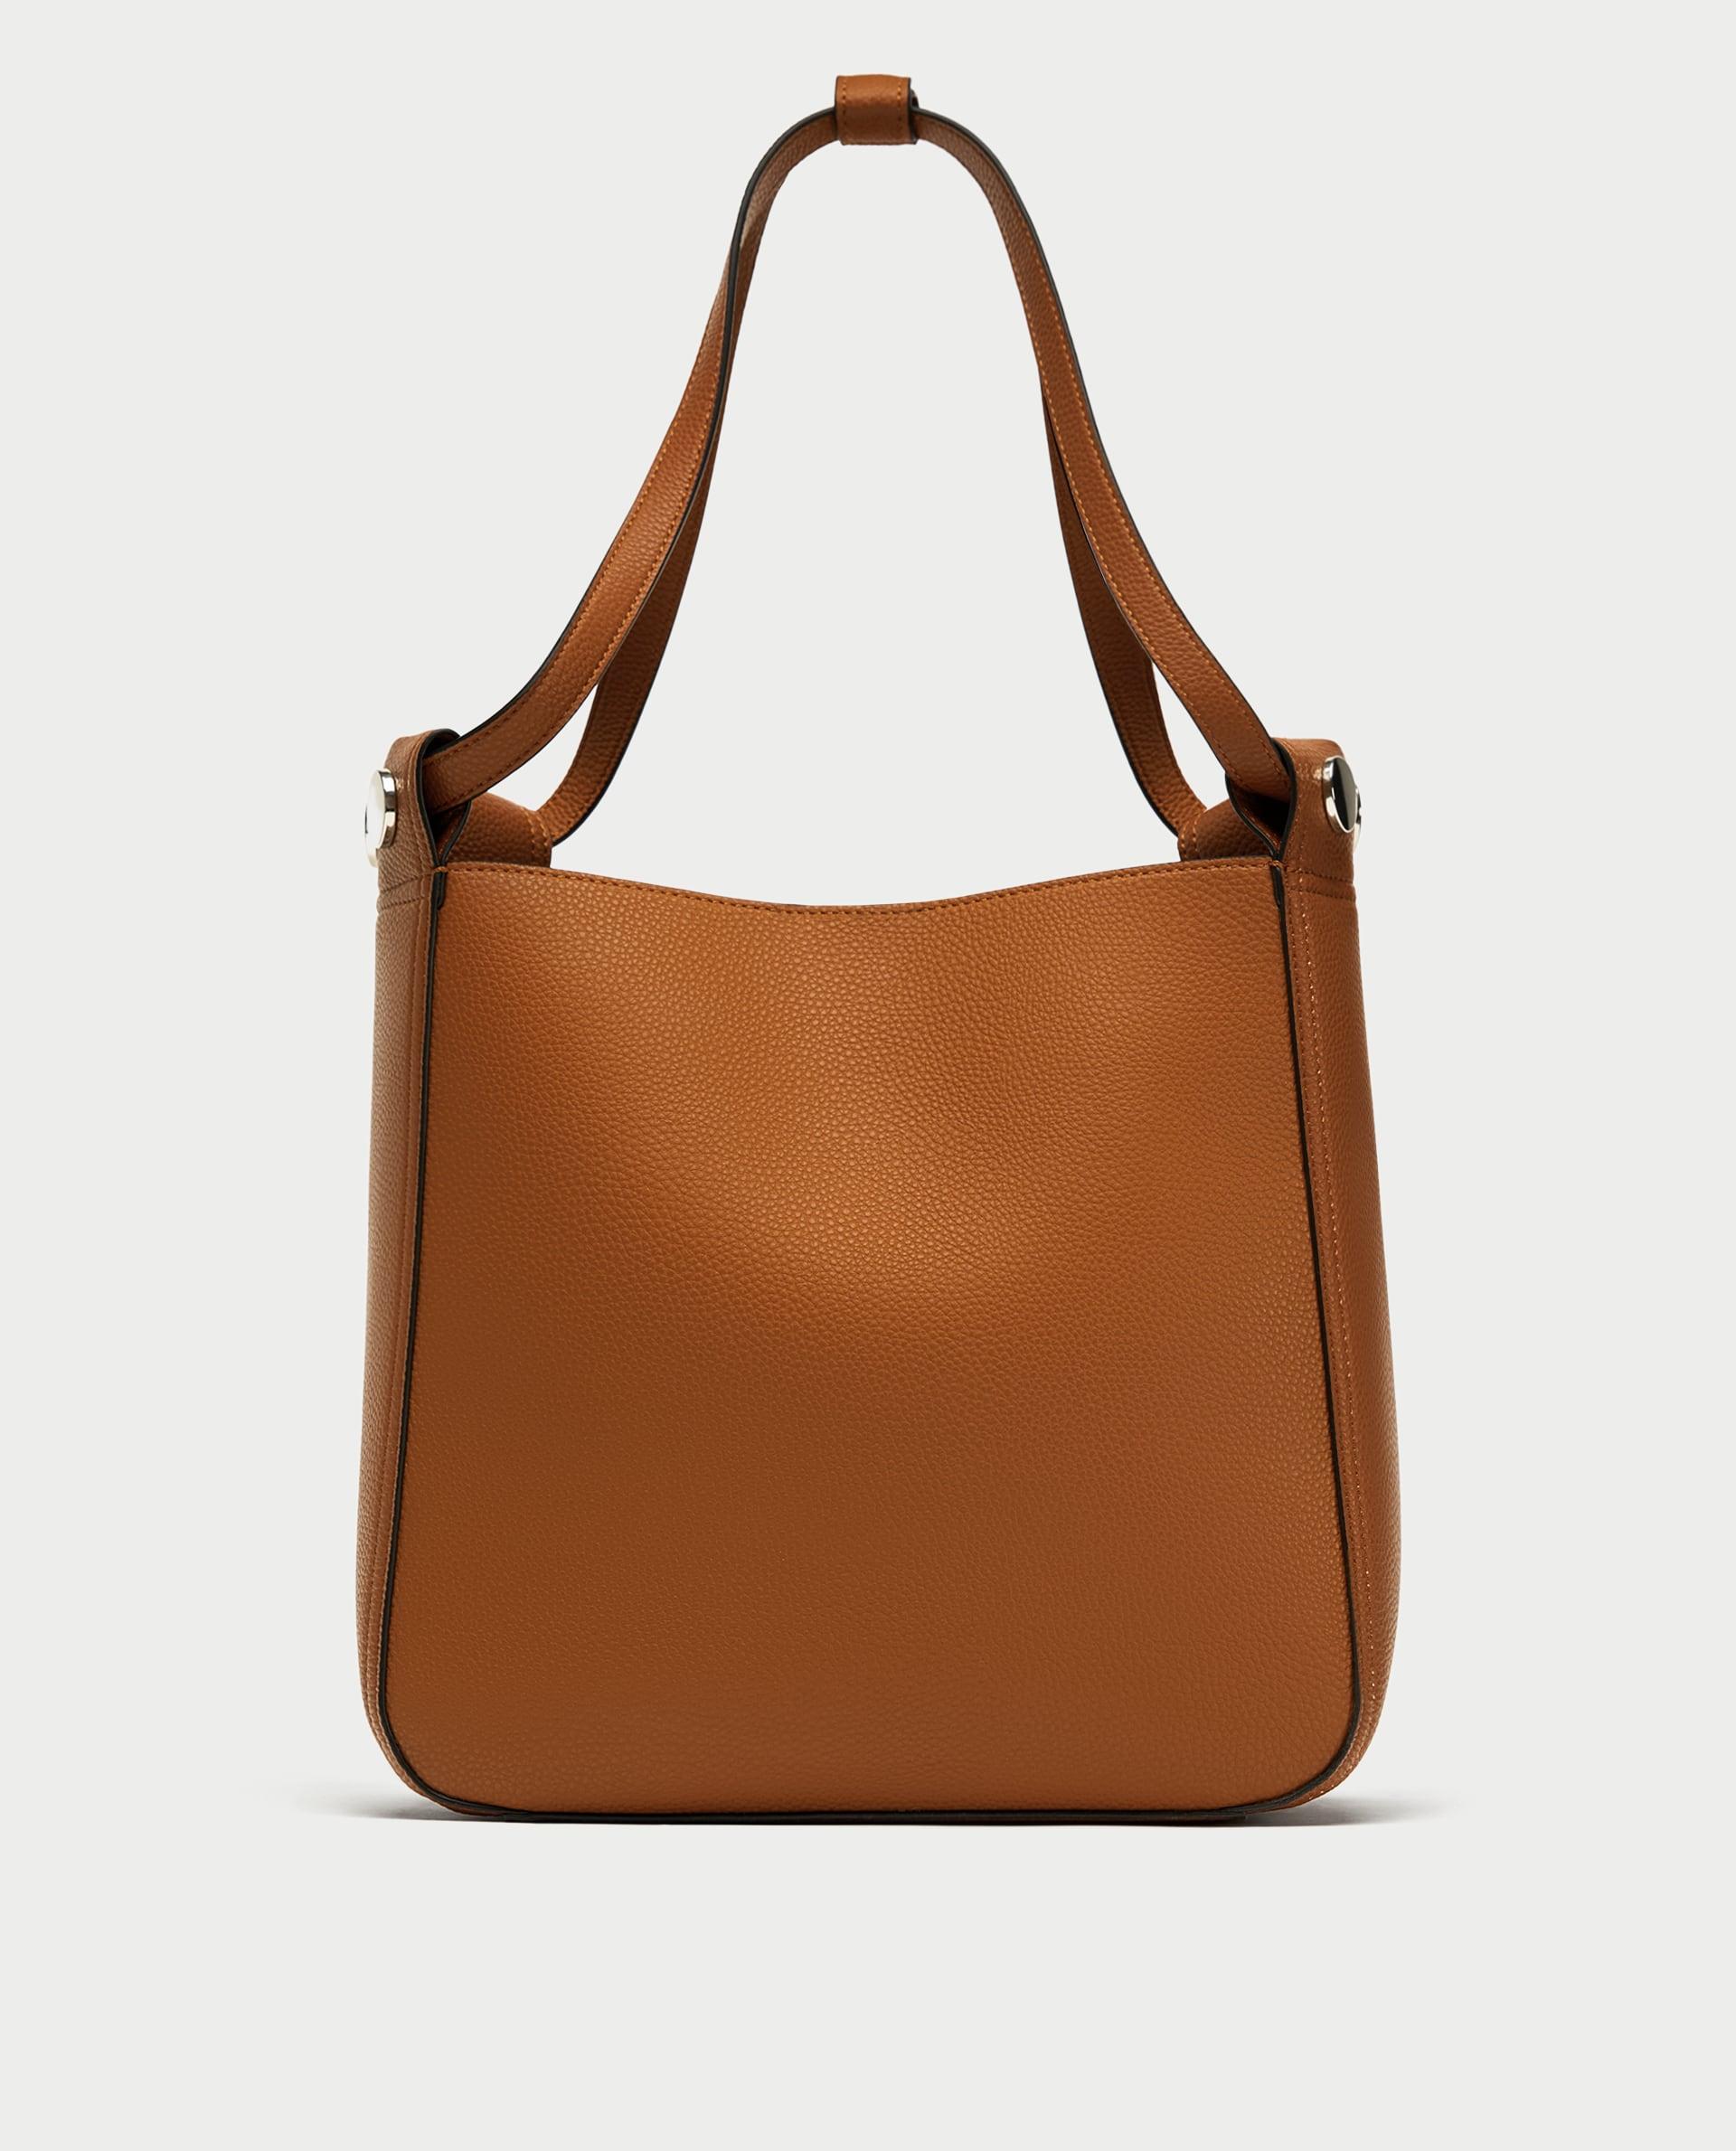 ZaraChloeLoewe Tan Trend Bag Tan Bag UGVpqMzS